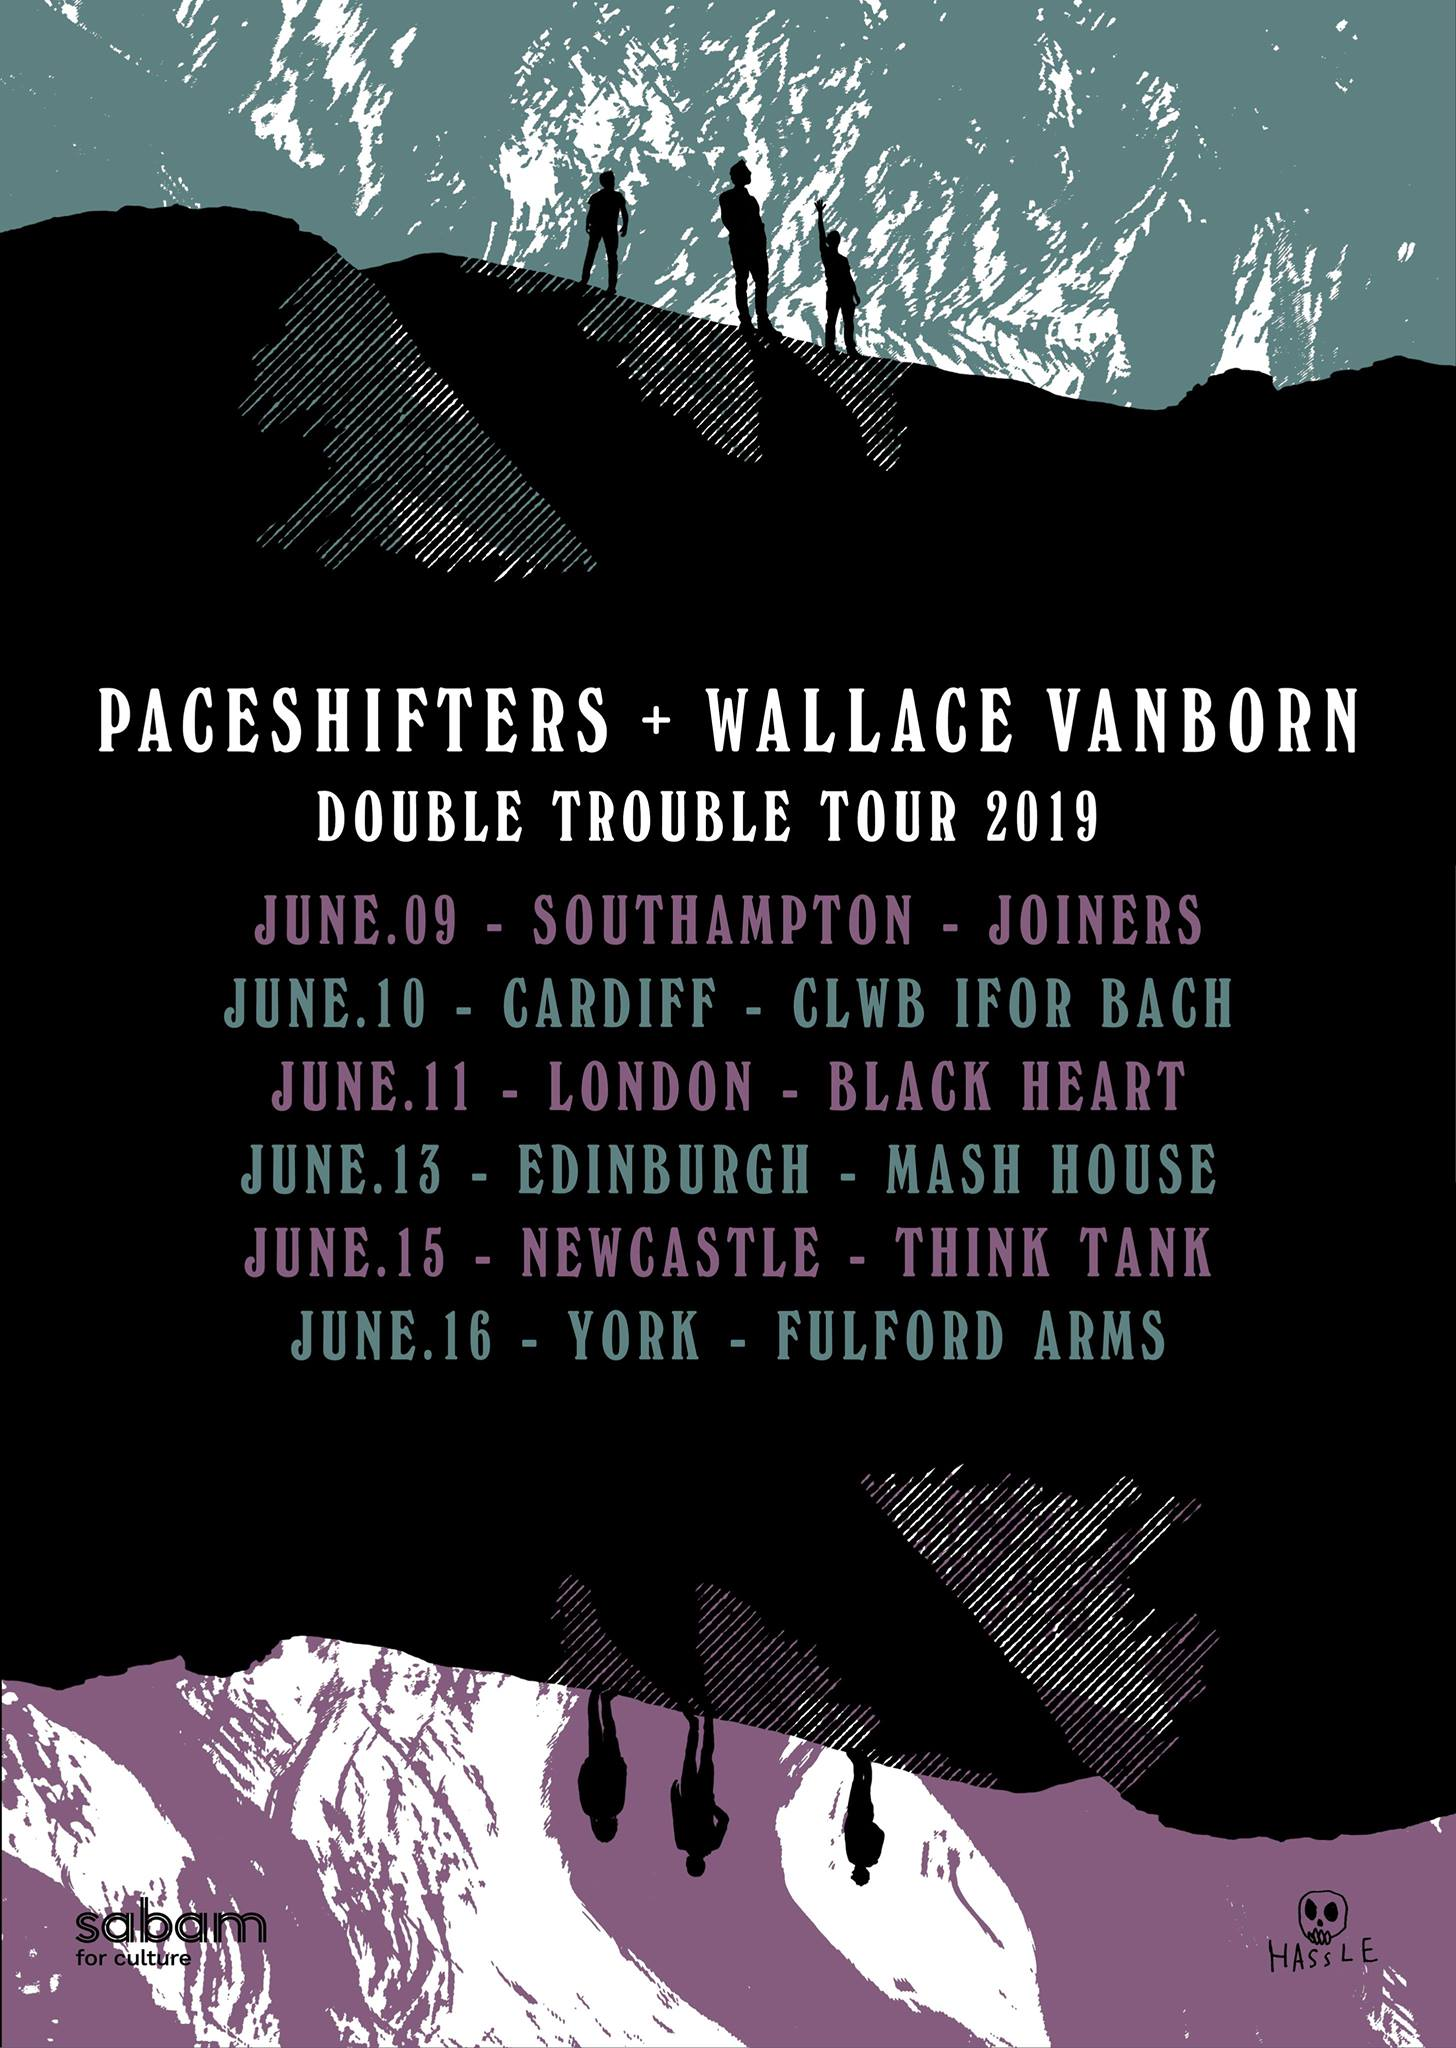 Paceshifters_Wallace Vanborn Tour Art.jpg